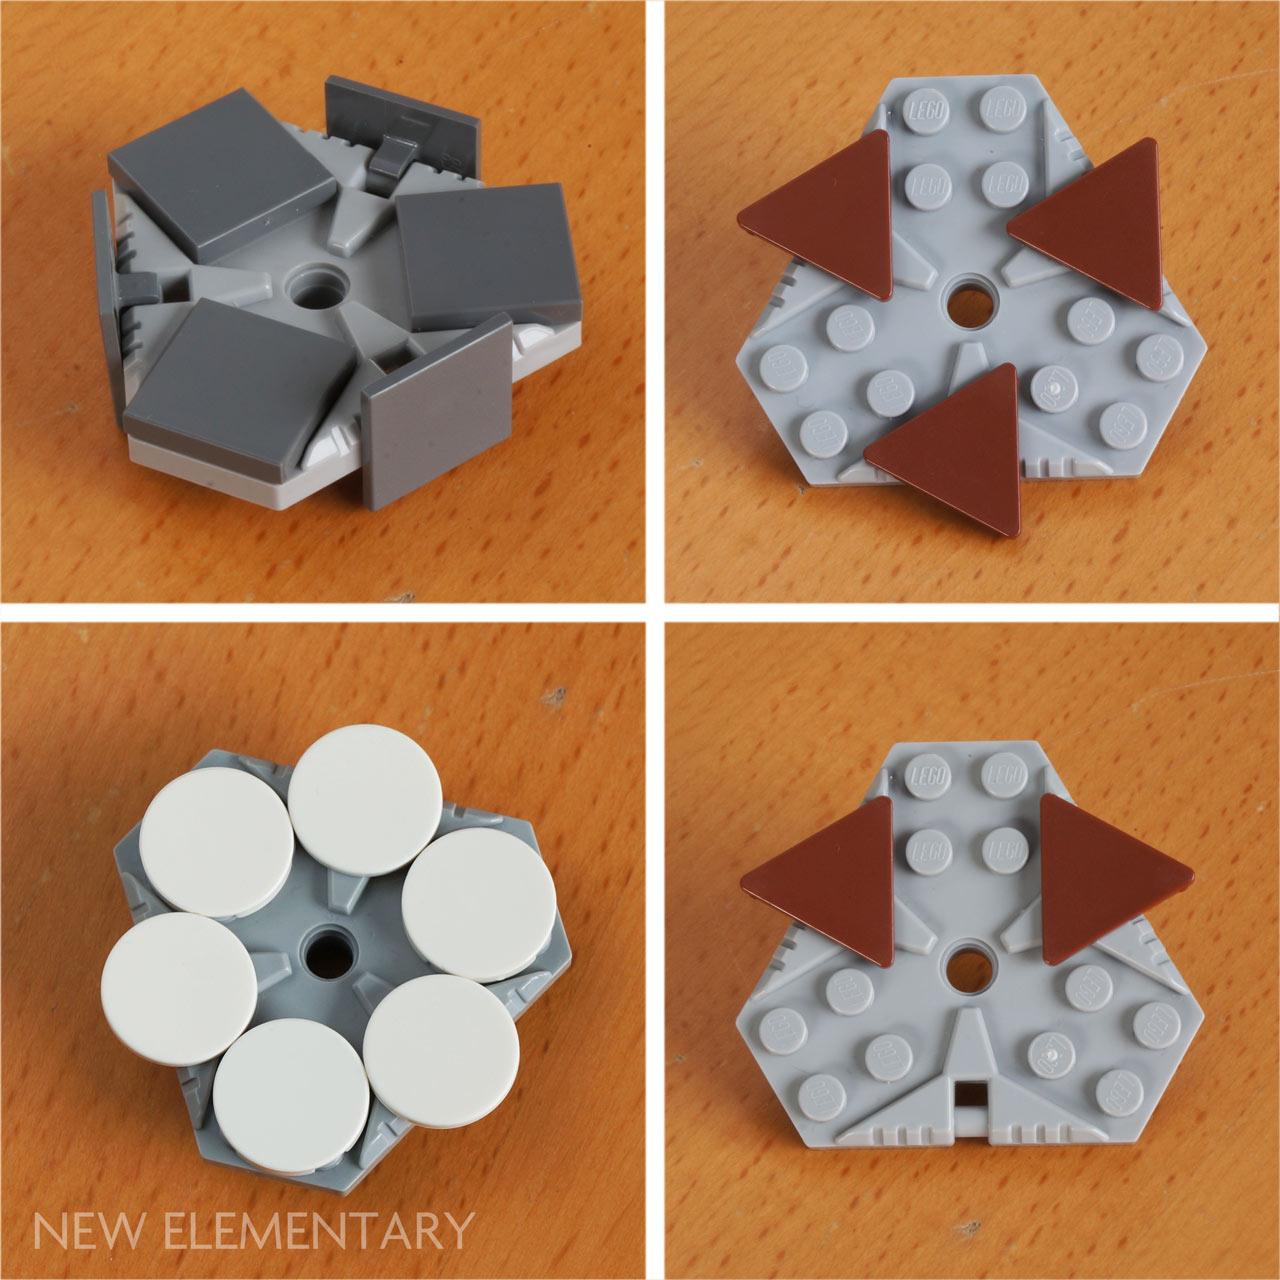 LEGO New Lot of 2 Light Bluish Gray 6x6 Hexagonal Nexo Power Plates Pin Hole